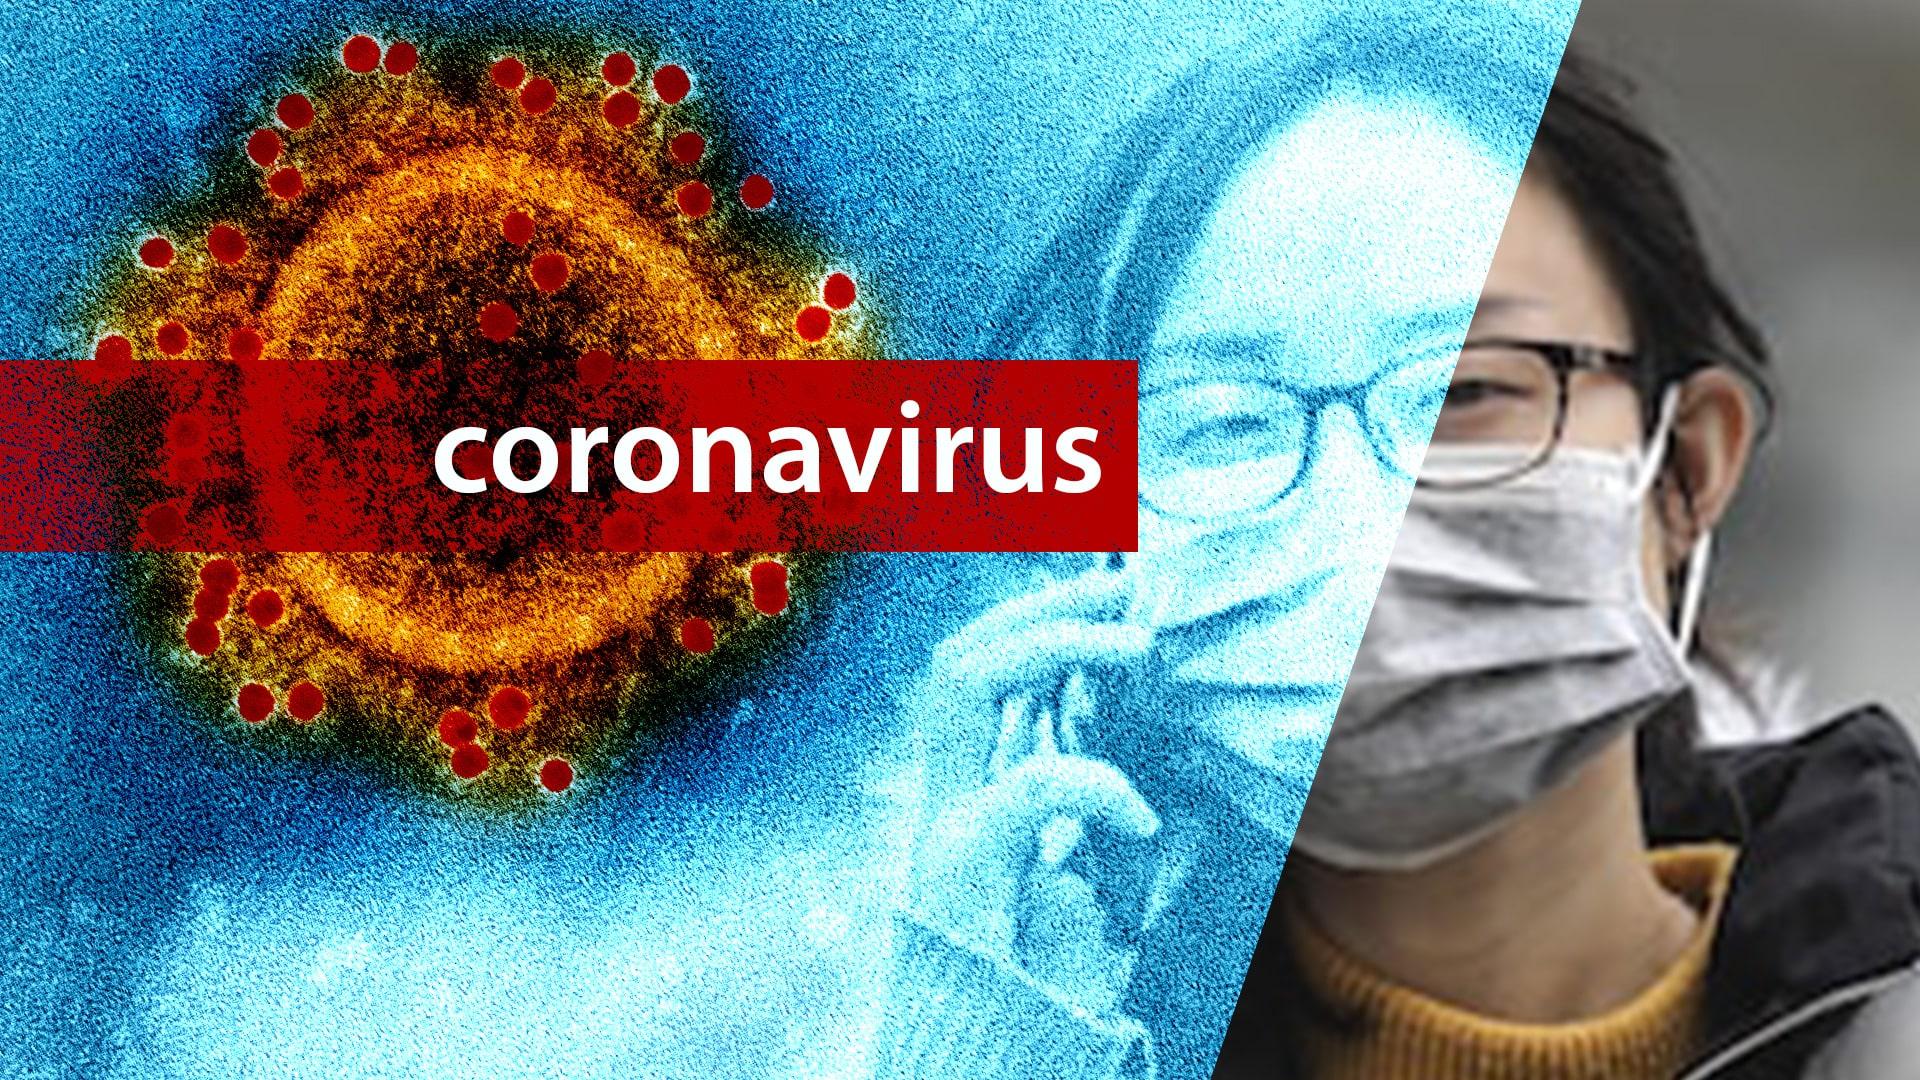 Coronavirus: un contagiato a Ravenna